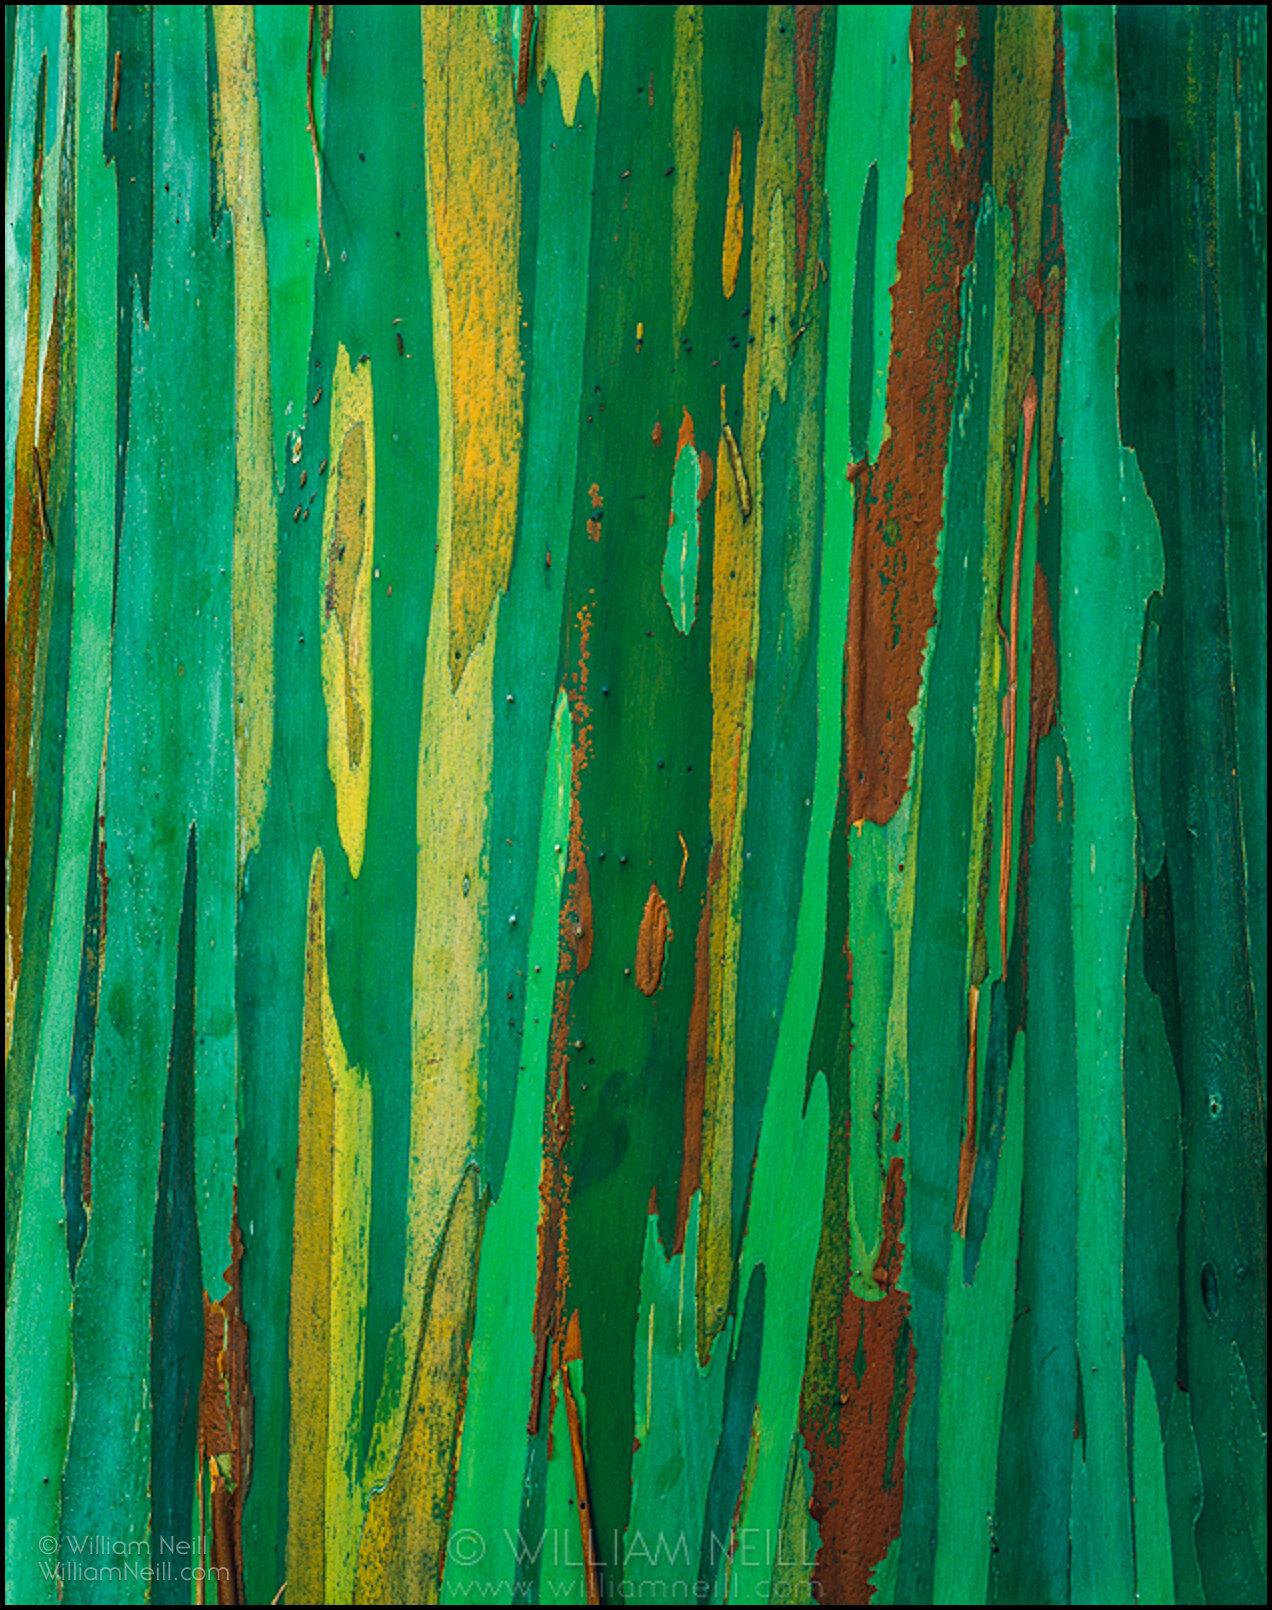 4x5, Abstract, Film, Large Format, Mindanao Gum Tree, Myrtaceae, deglupta, painted bark eucalyptus, rainbow bark eucalyptus, vertical, photo